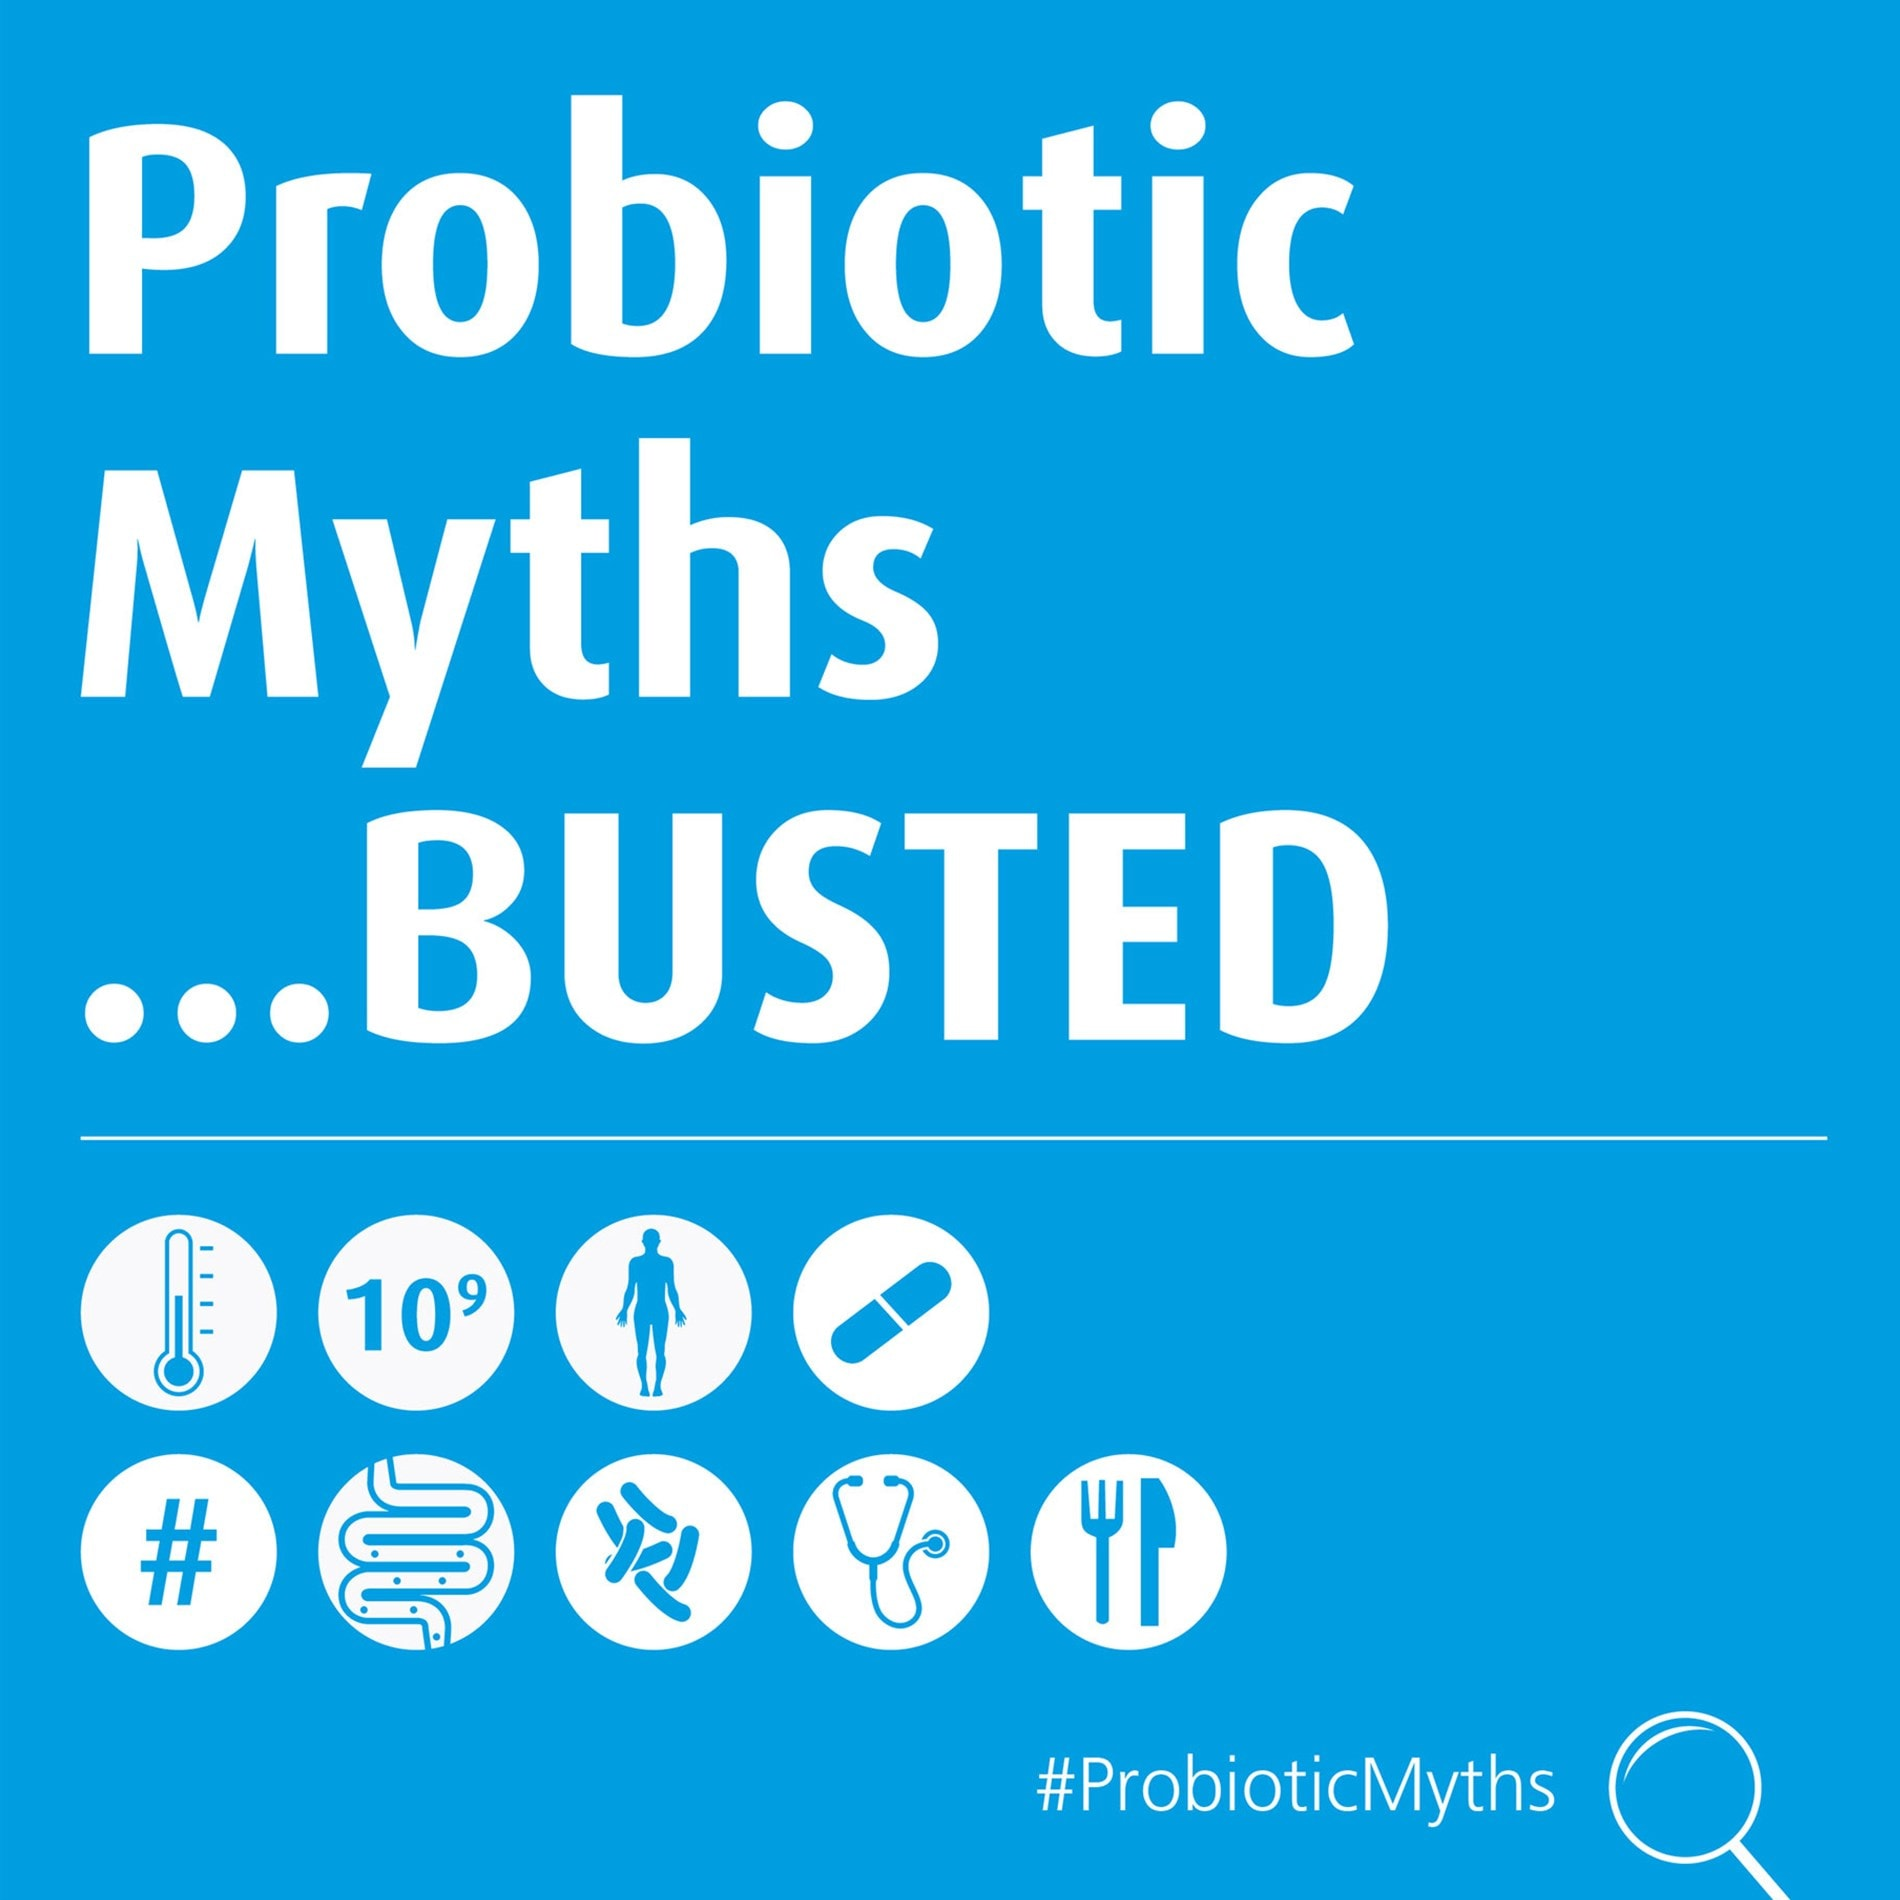 Probiotic Myths